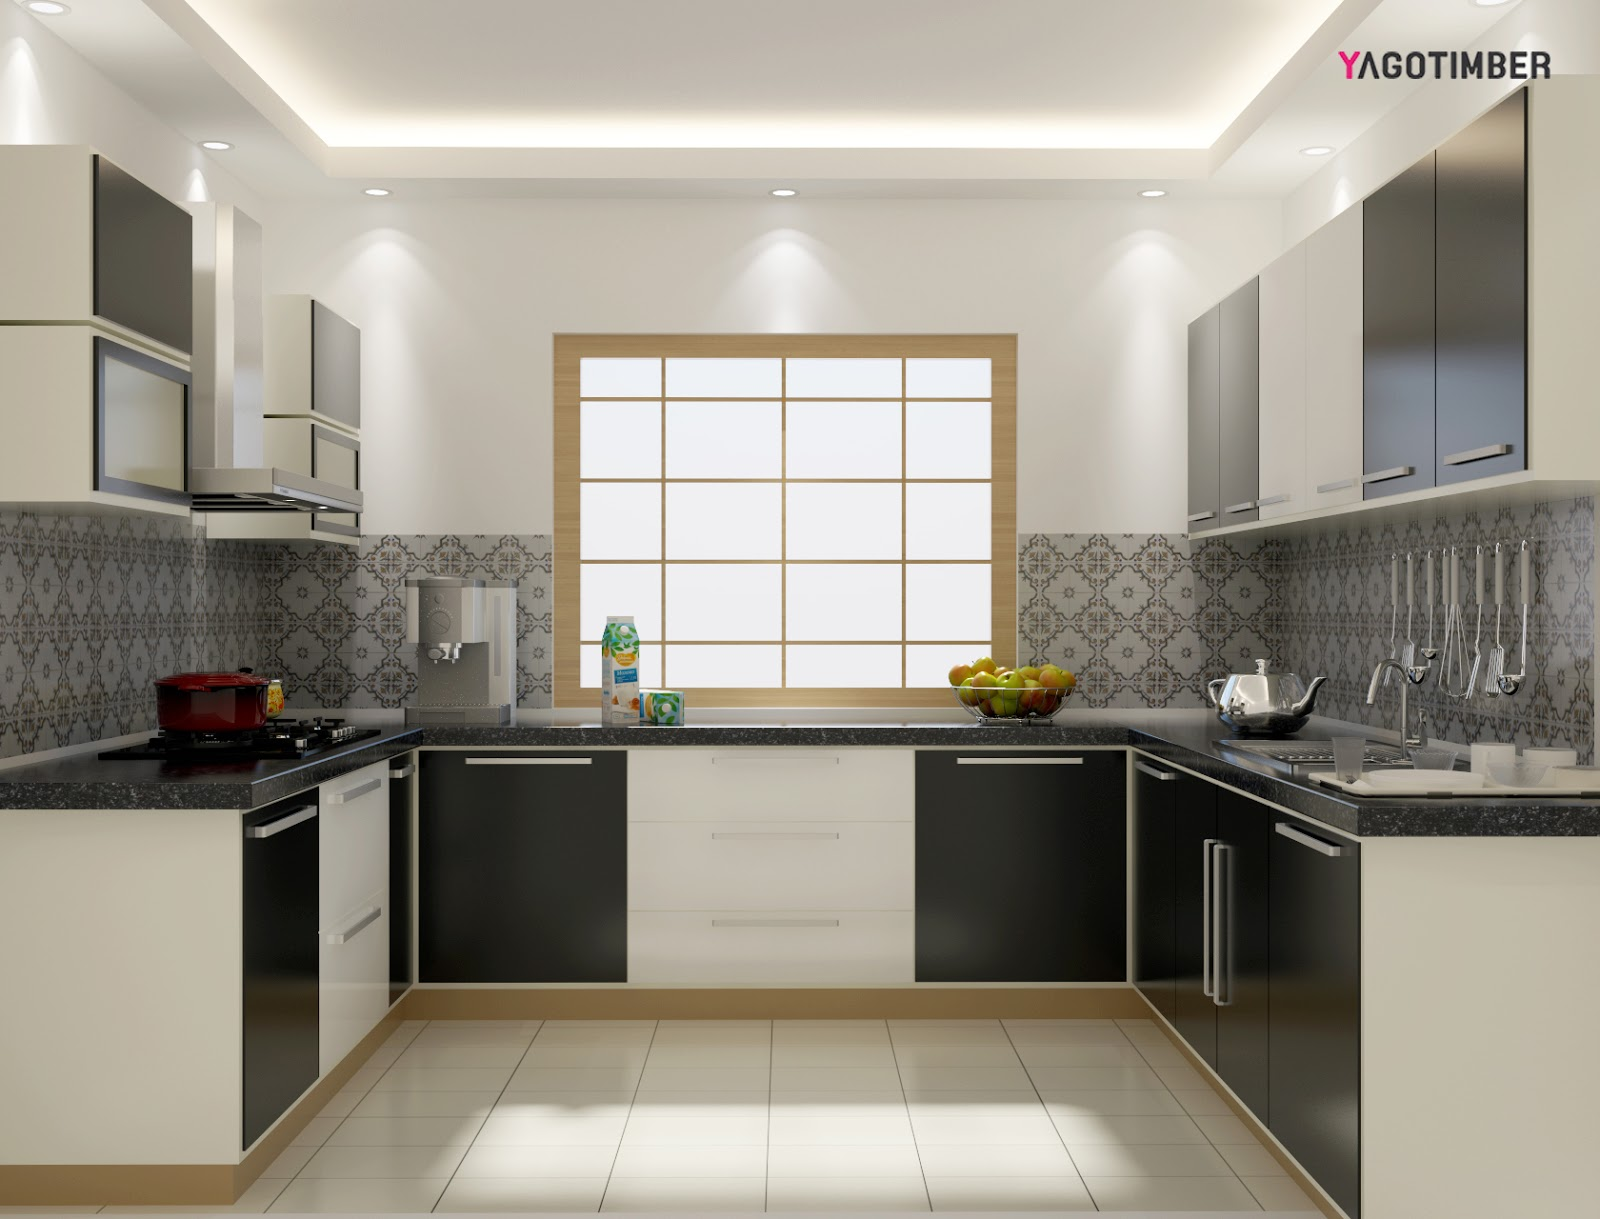 modular kitchen interior designs. Black Bedroom Furniture Sets. Home Design Ideas